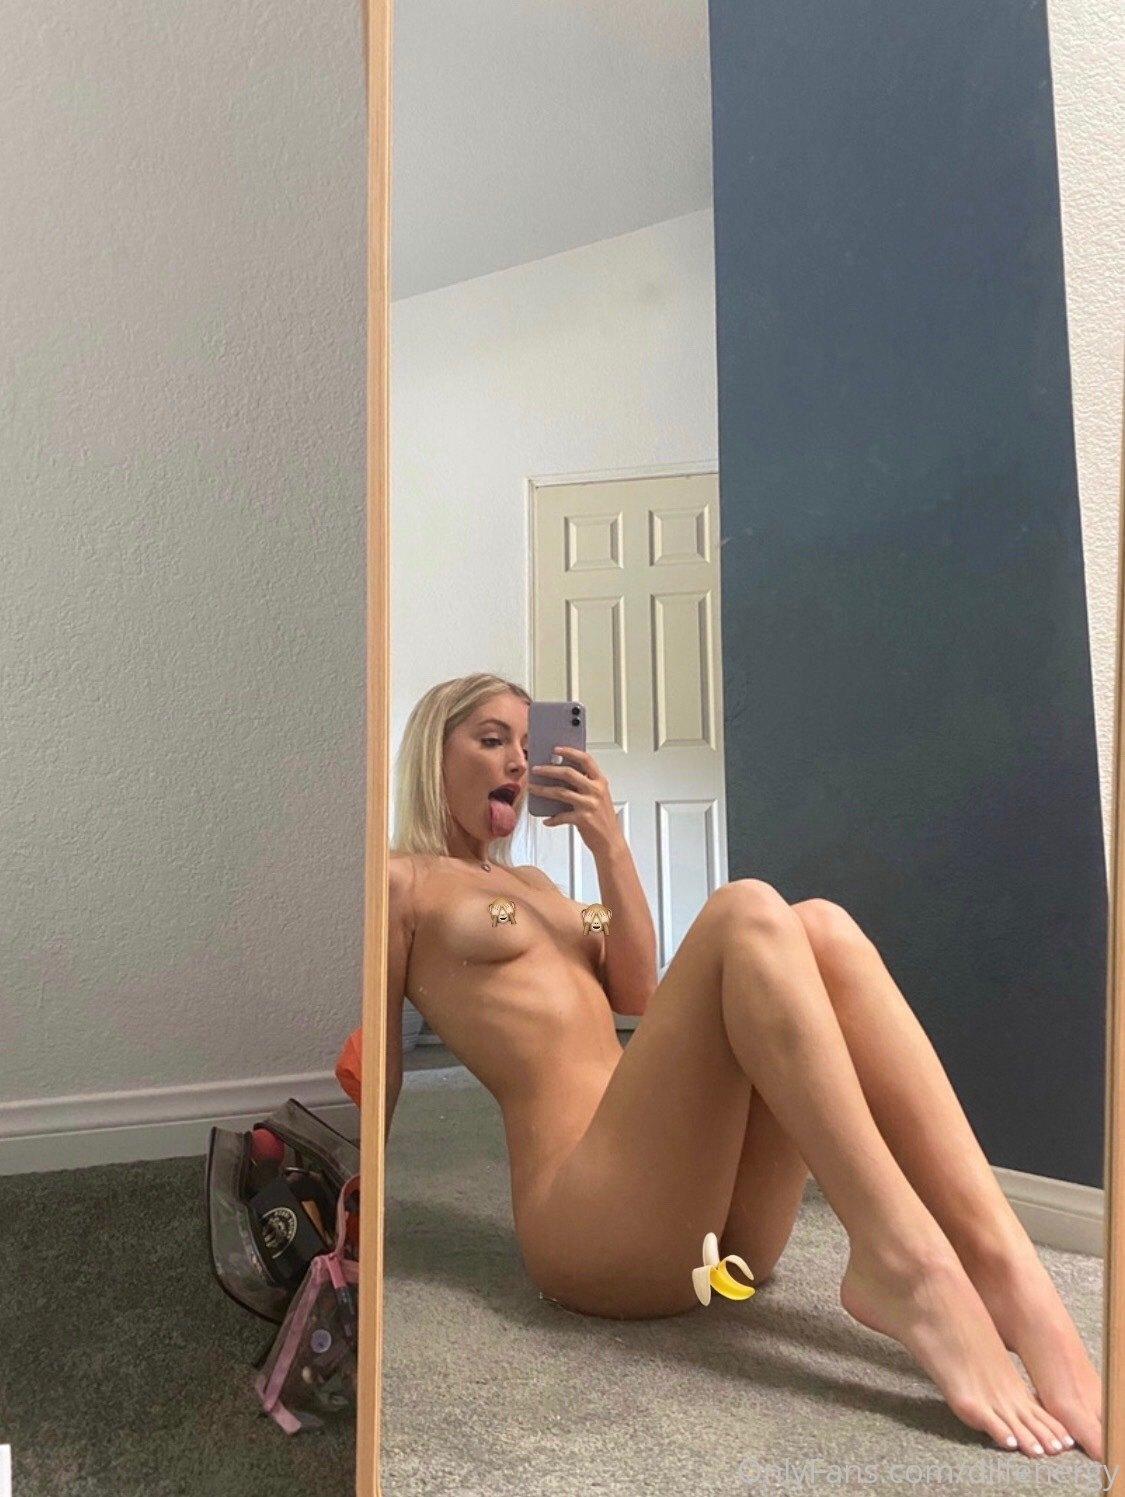 Polemicgirls.com